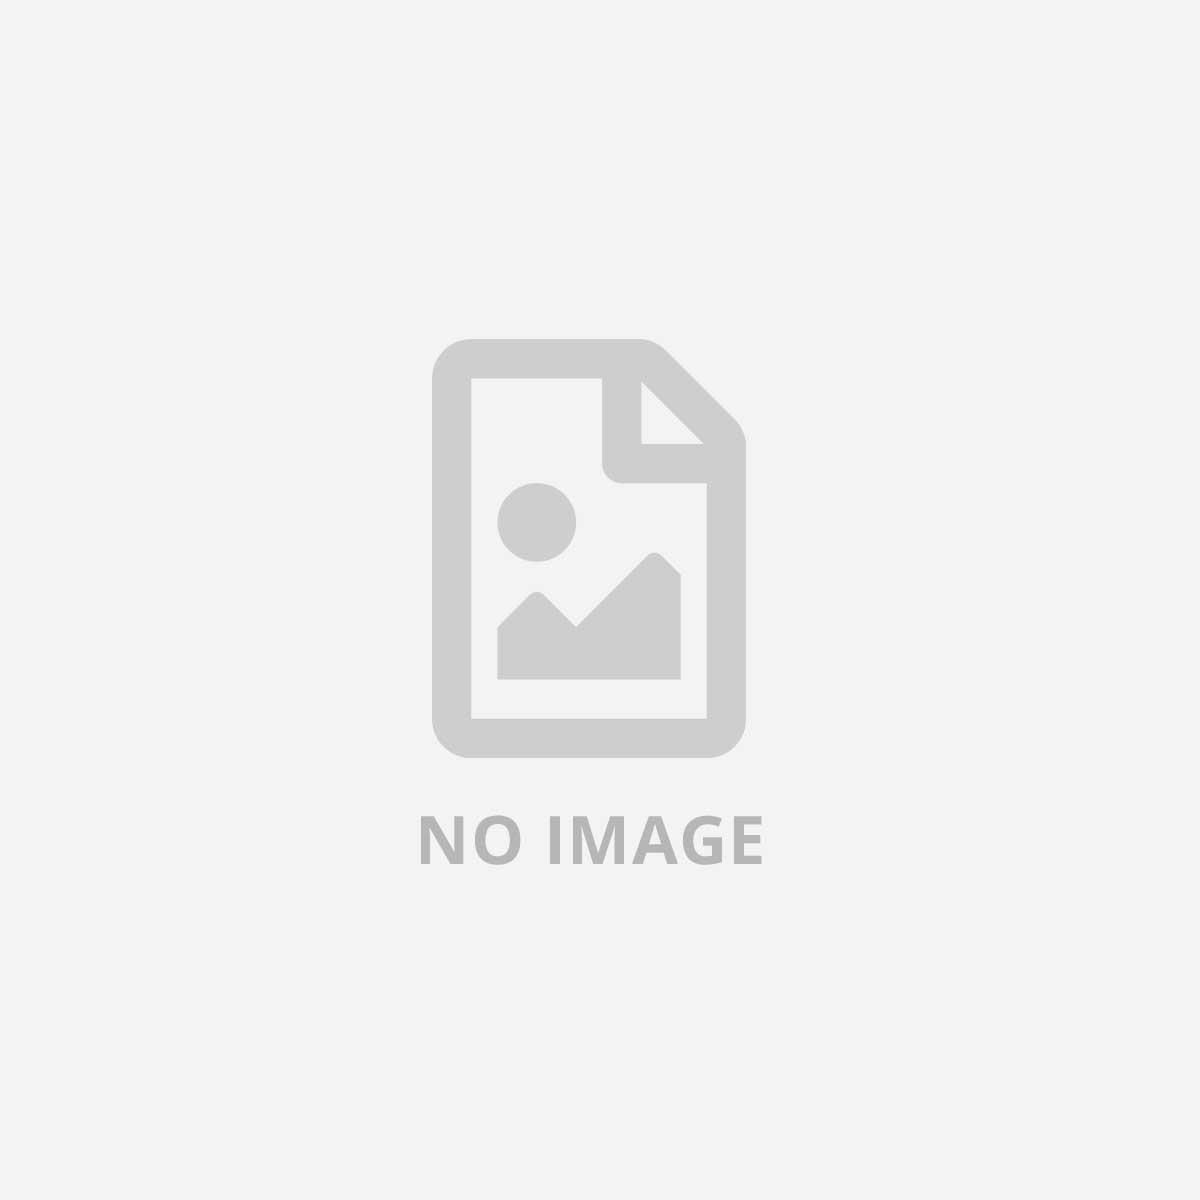 ITRACK ARMADI KIT STAFFE 1U NERO PER DVR/NVR